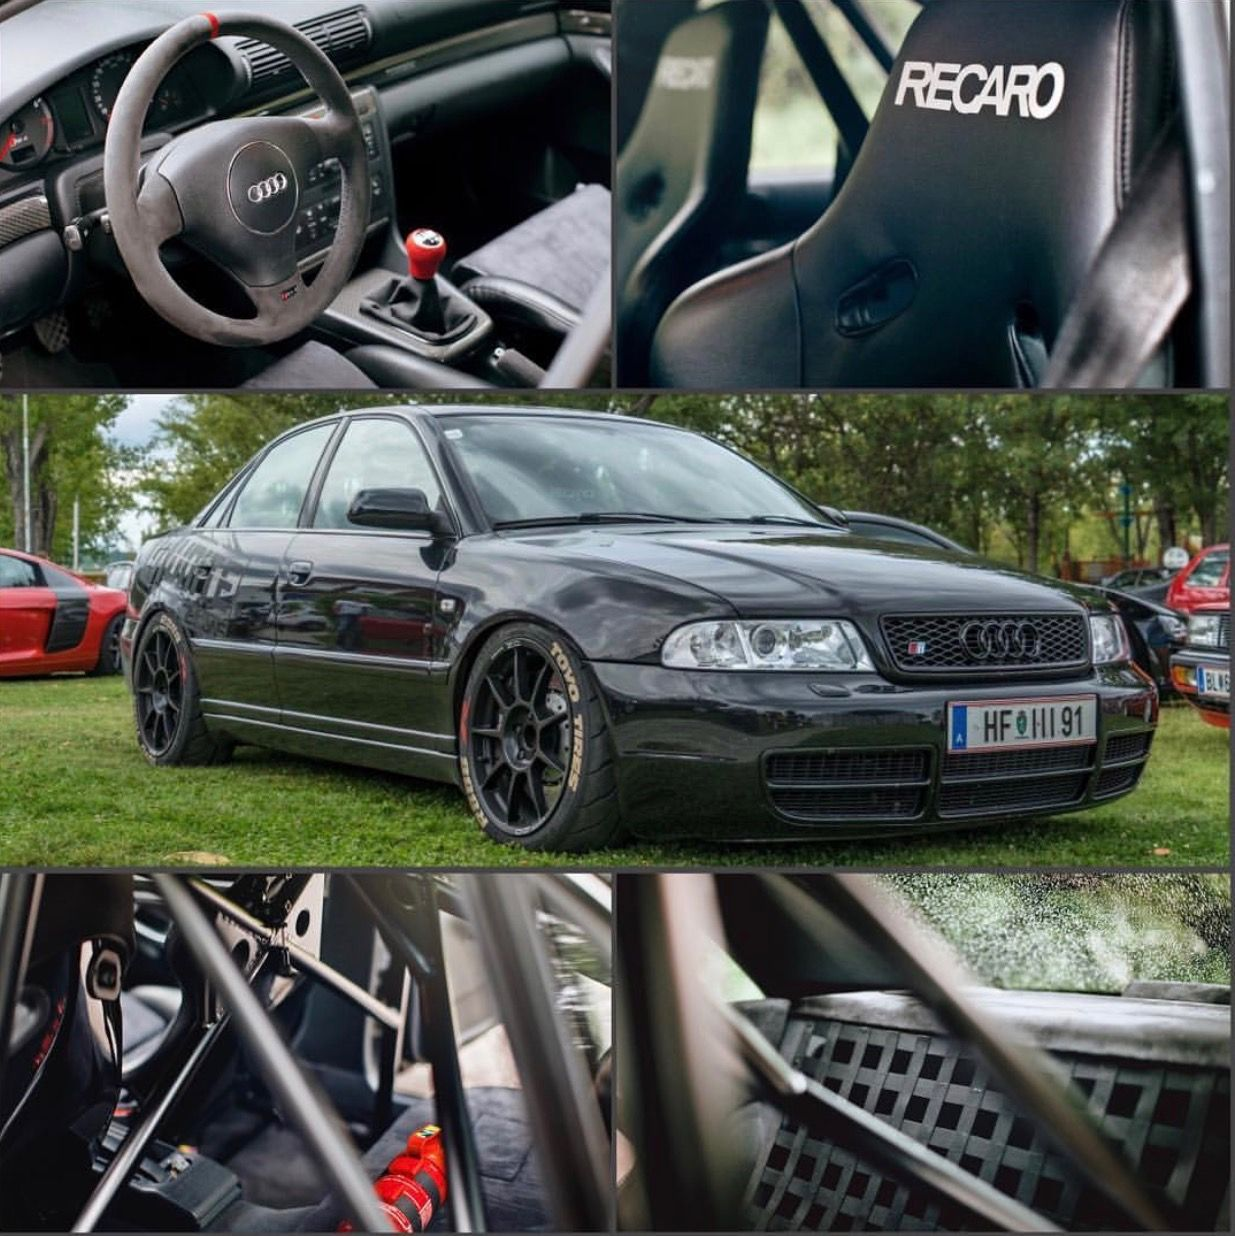 Pin By Beeznsn On Audi A4 S4 Rs4 B5 Audi Motorsport Audi S4 Audi Wagon